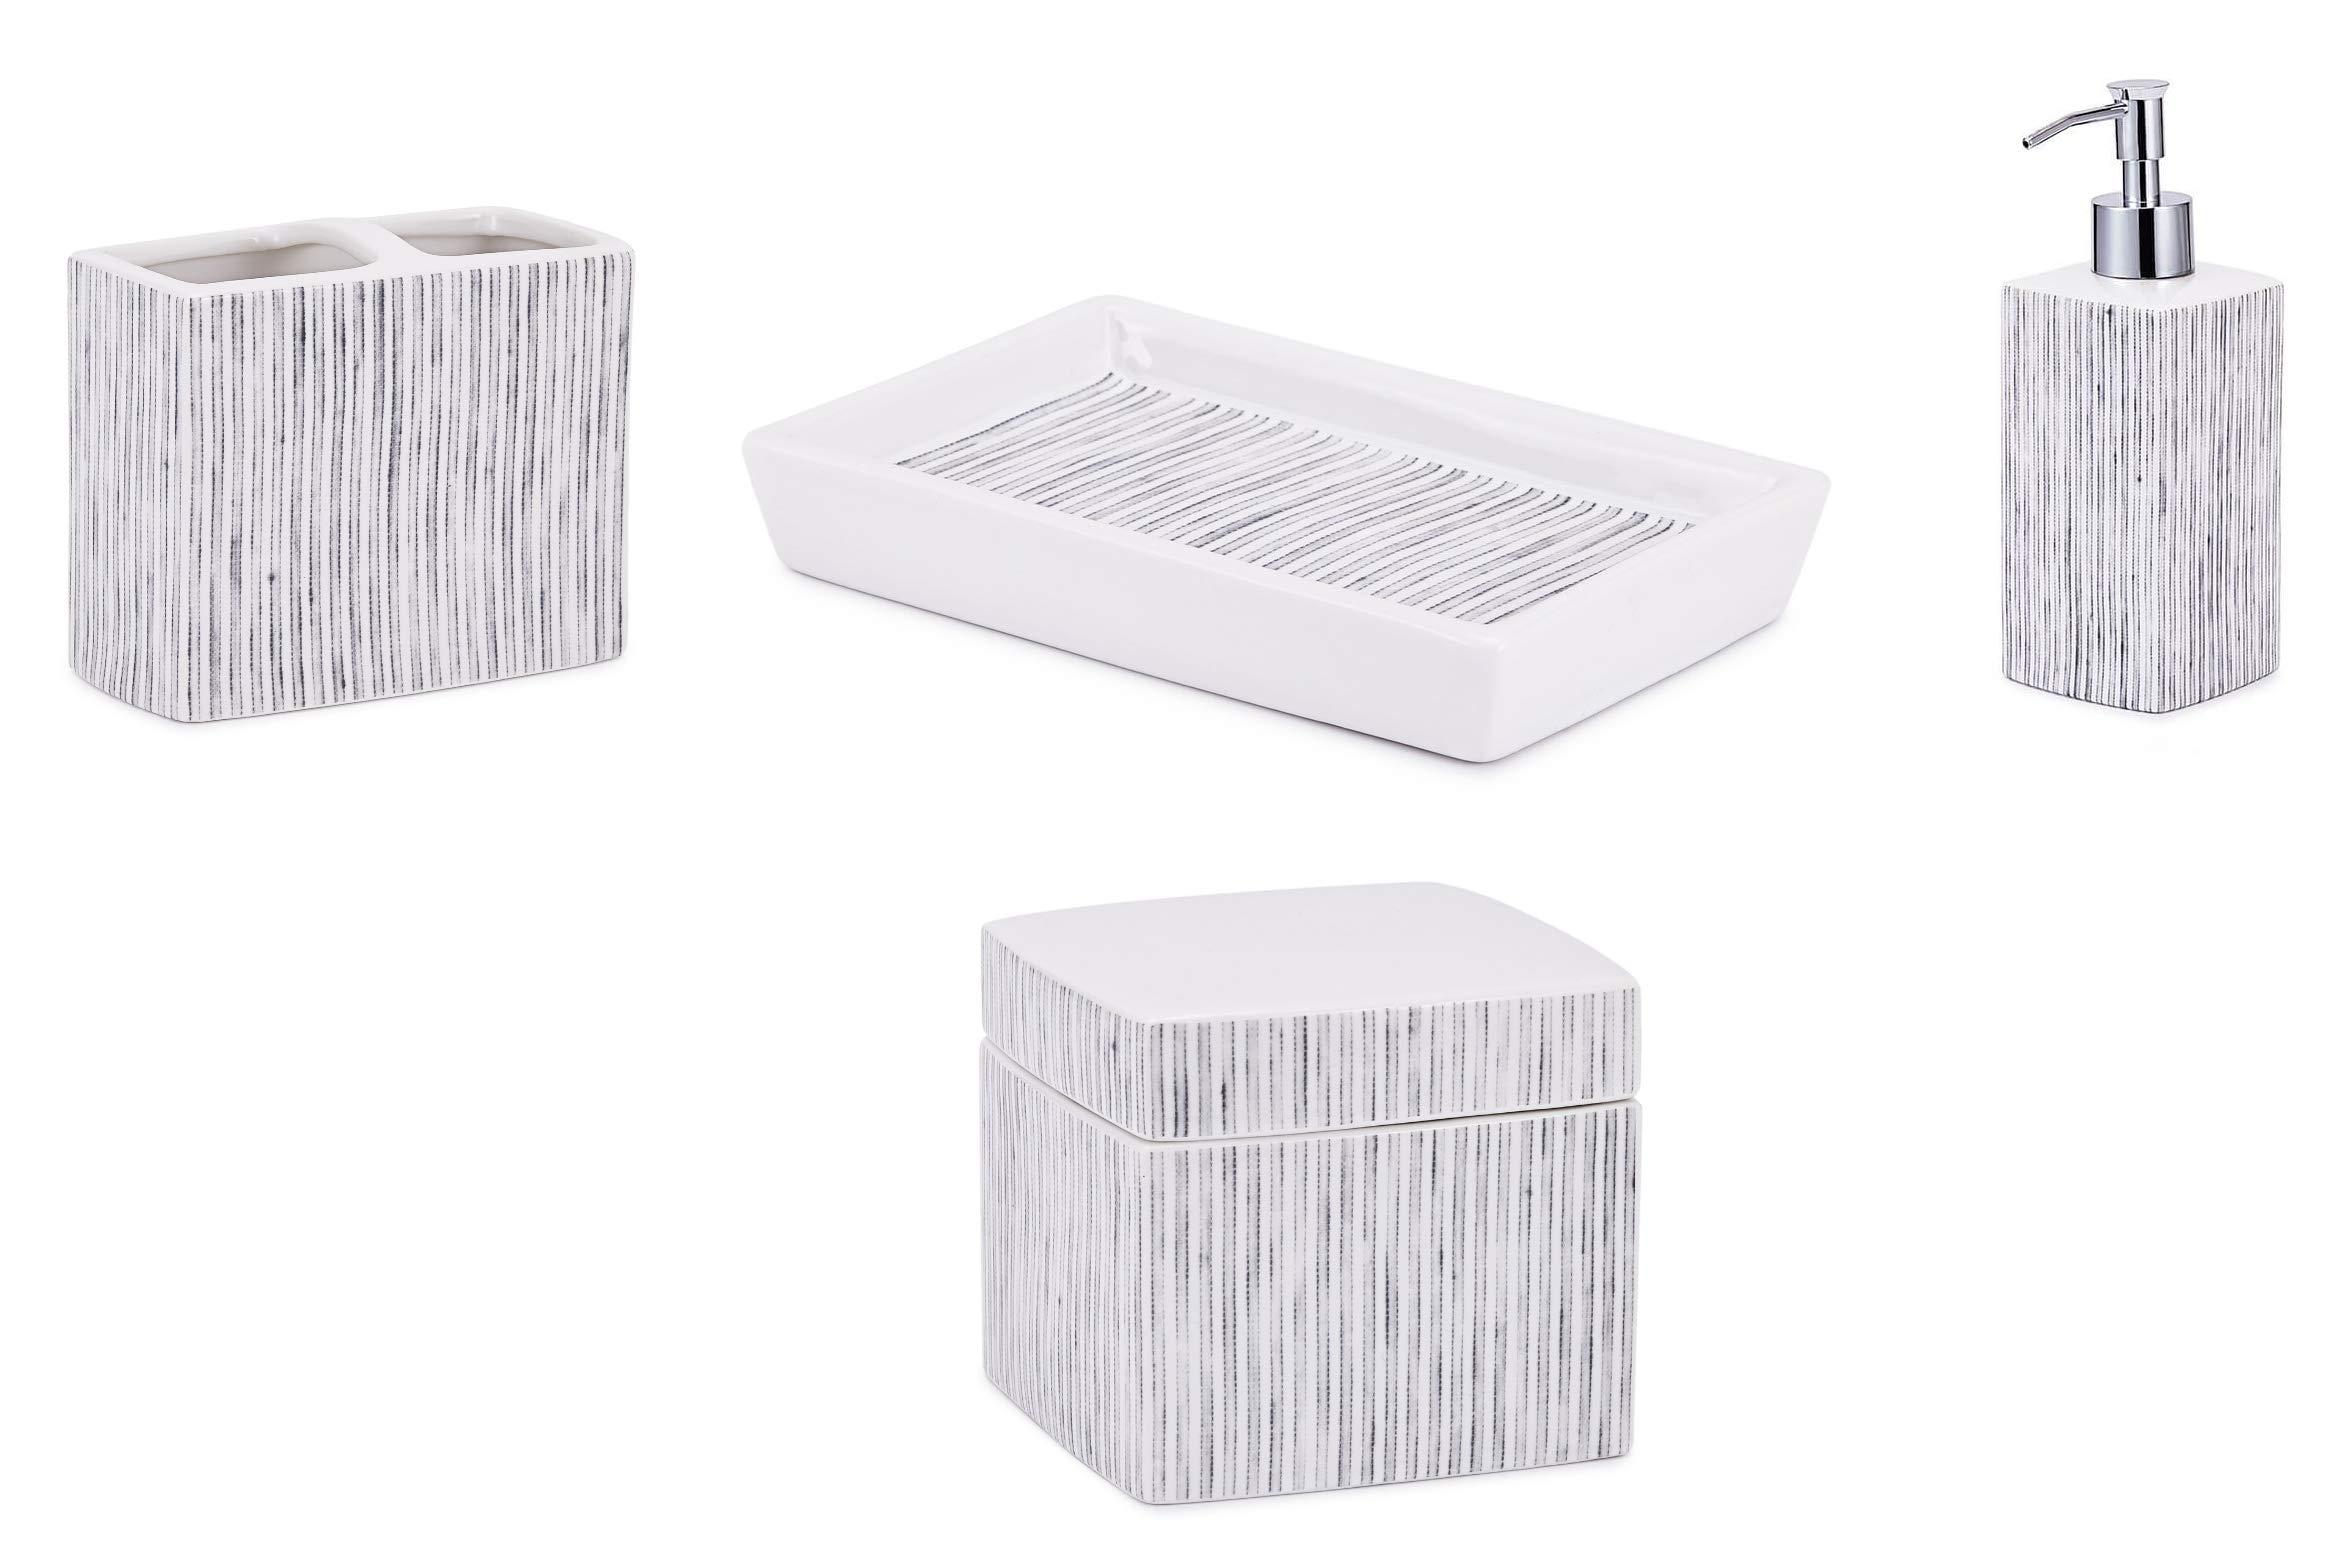 Kassatex 4-Piece Bath Accessory Set, Wainscott Bath Accessories | Lotion Dispenser, Toothbrush Holder, Tray, Cotton Jar